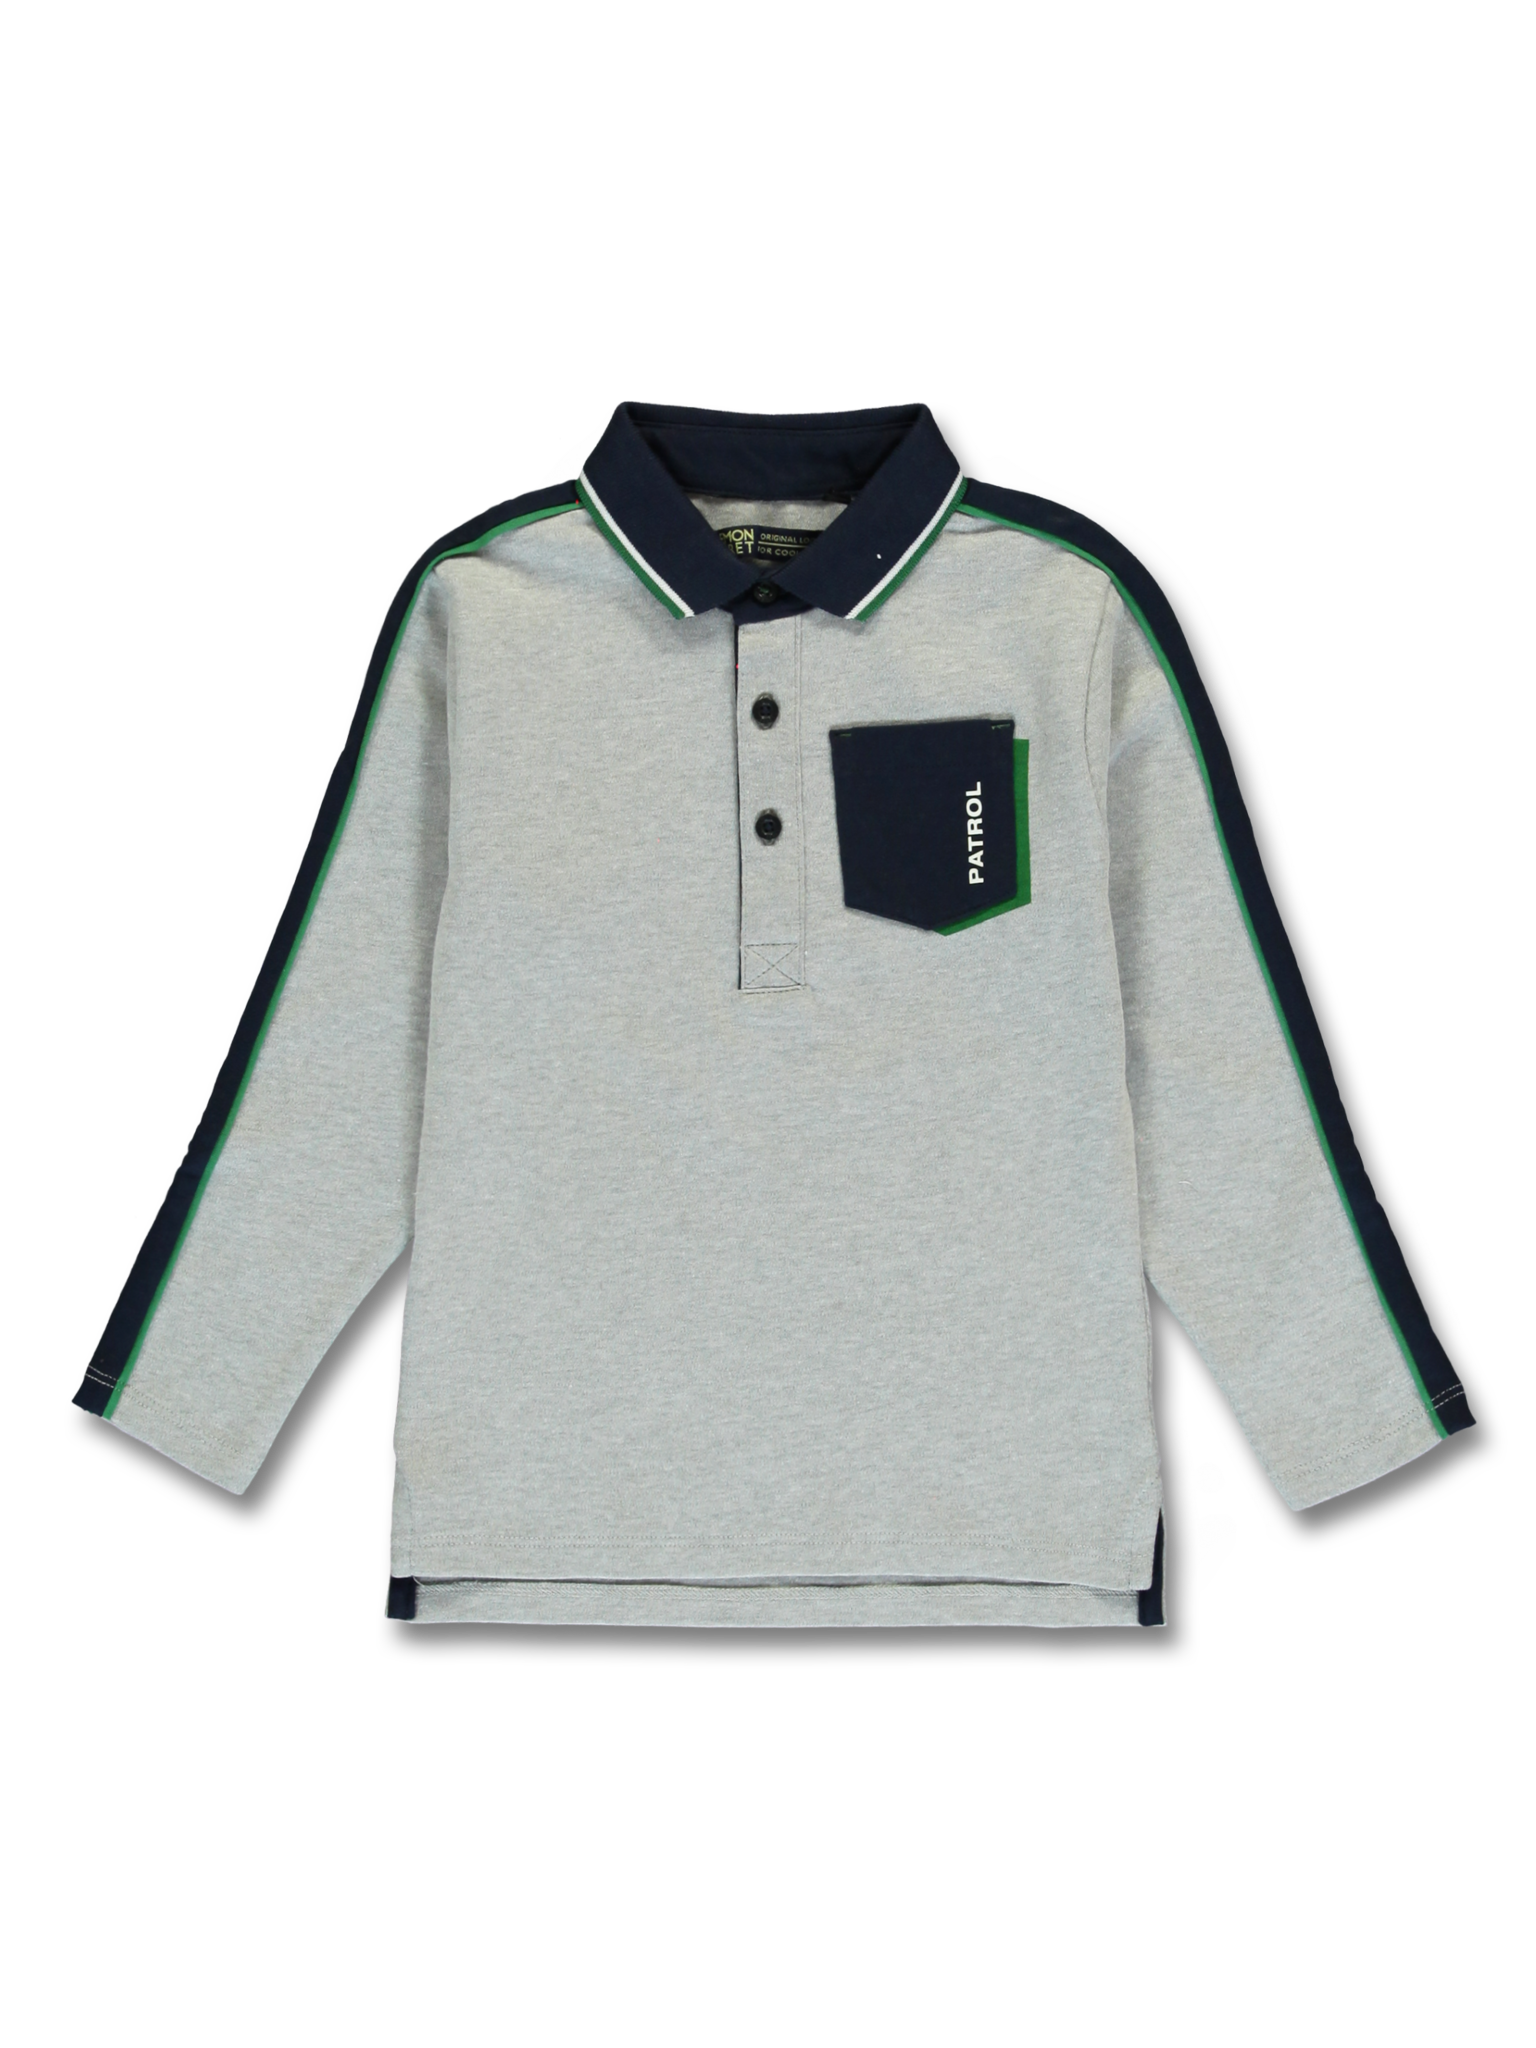 All Brands   Winterproducts Small Boys   Polo   12 pcs/box